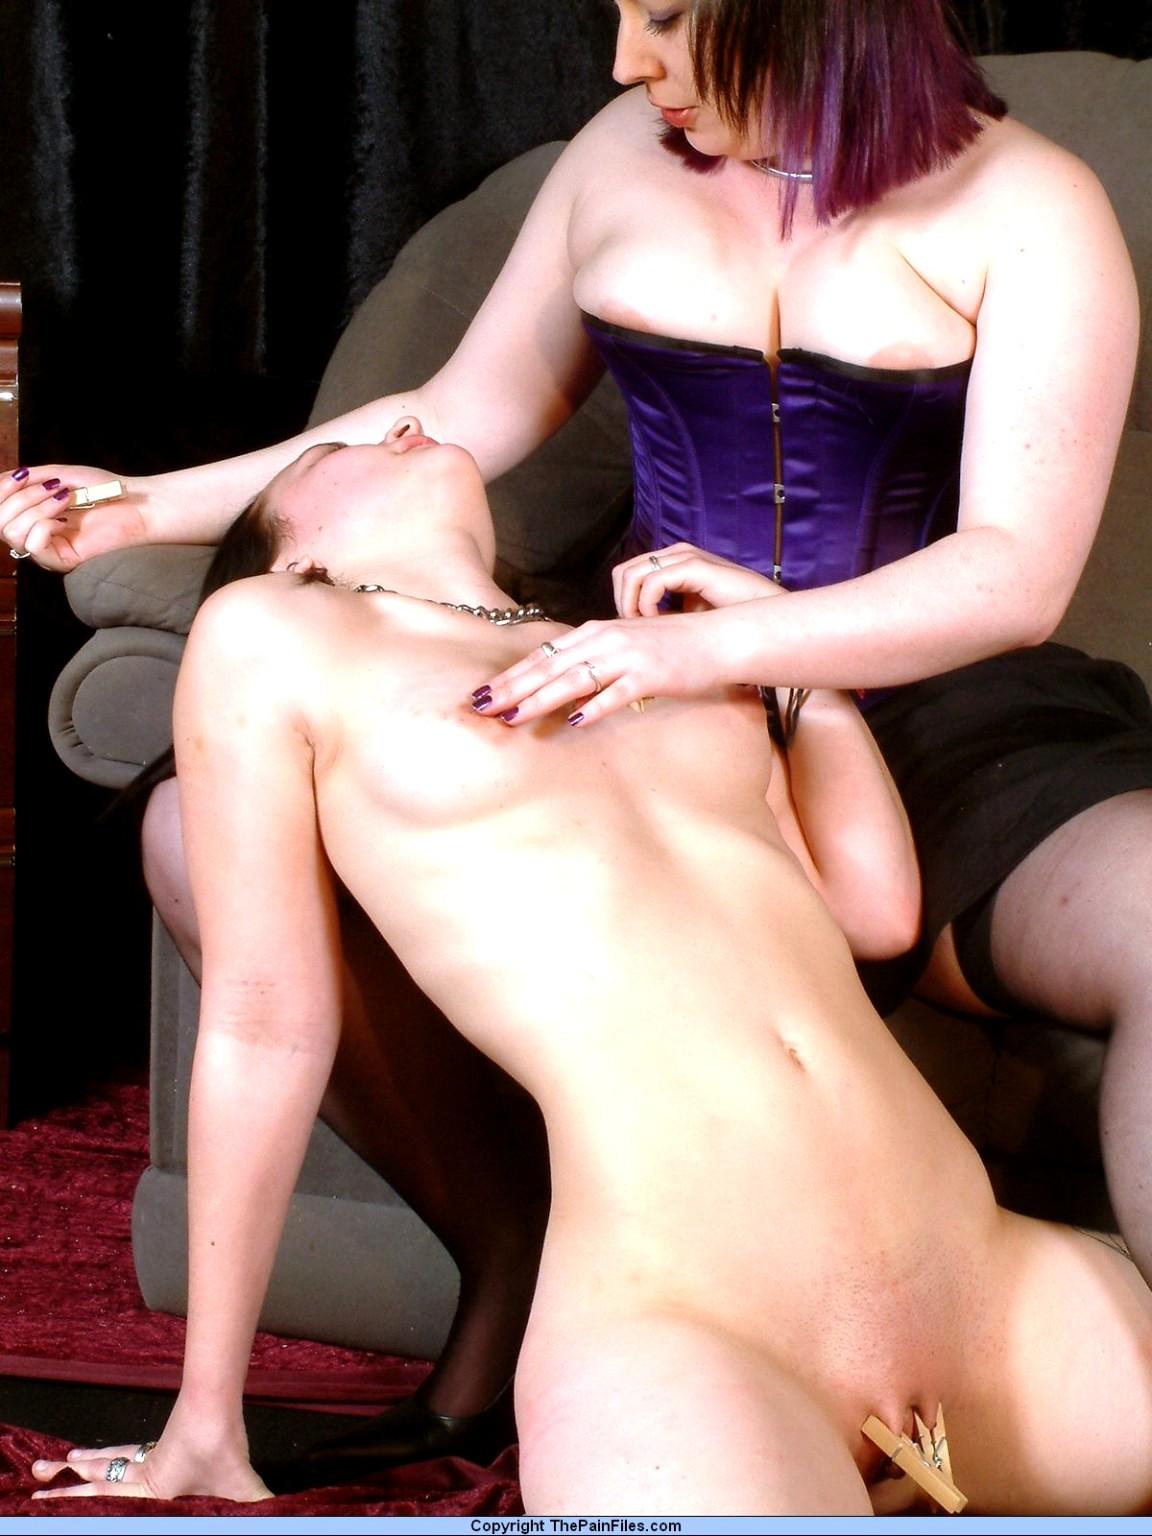 Bdsm spanking, porn galery